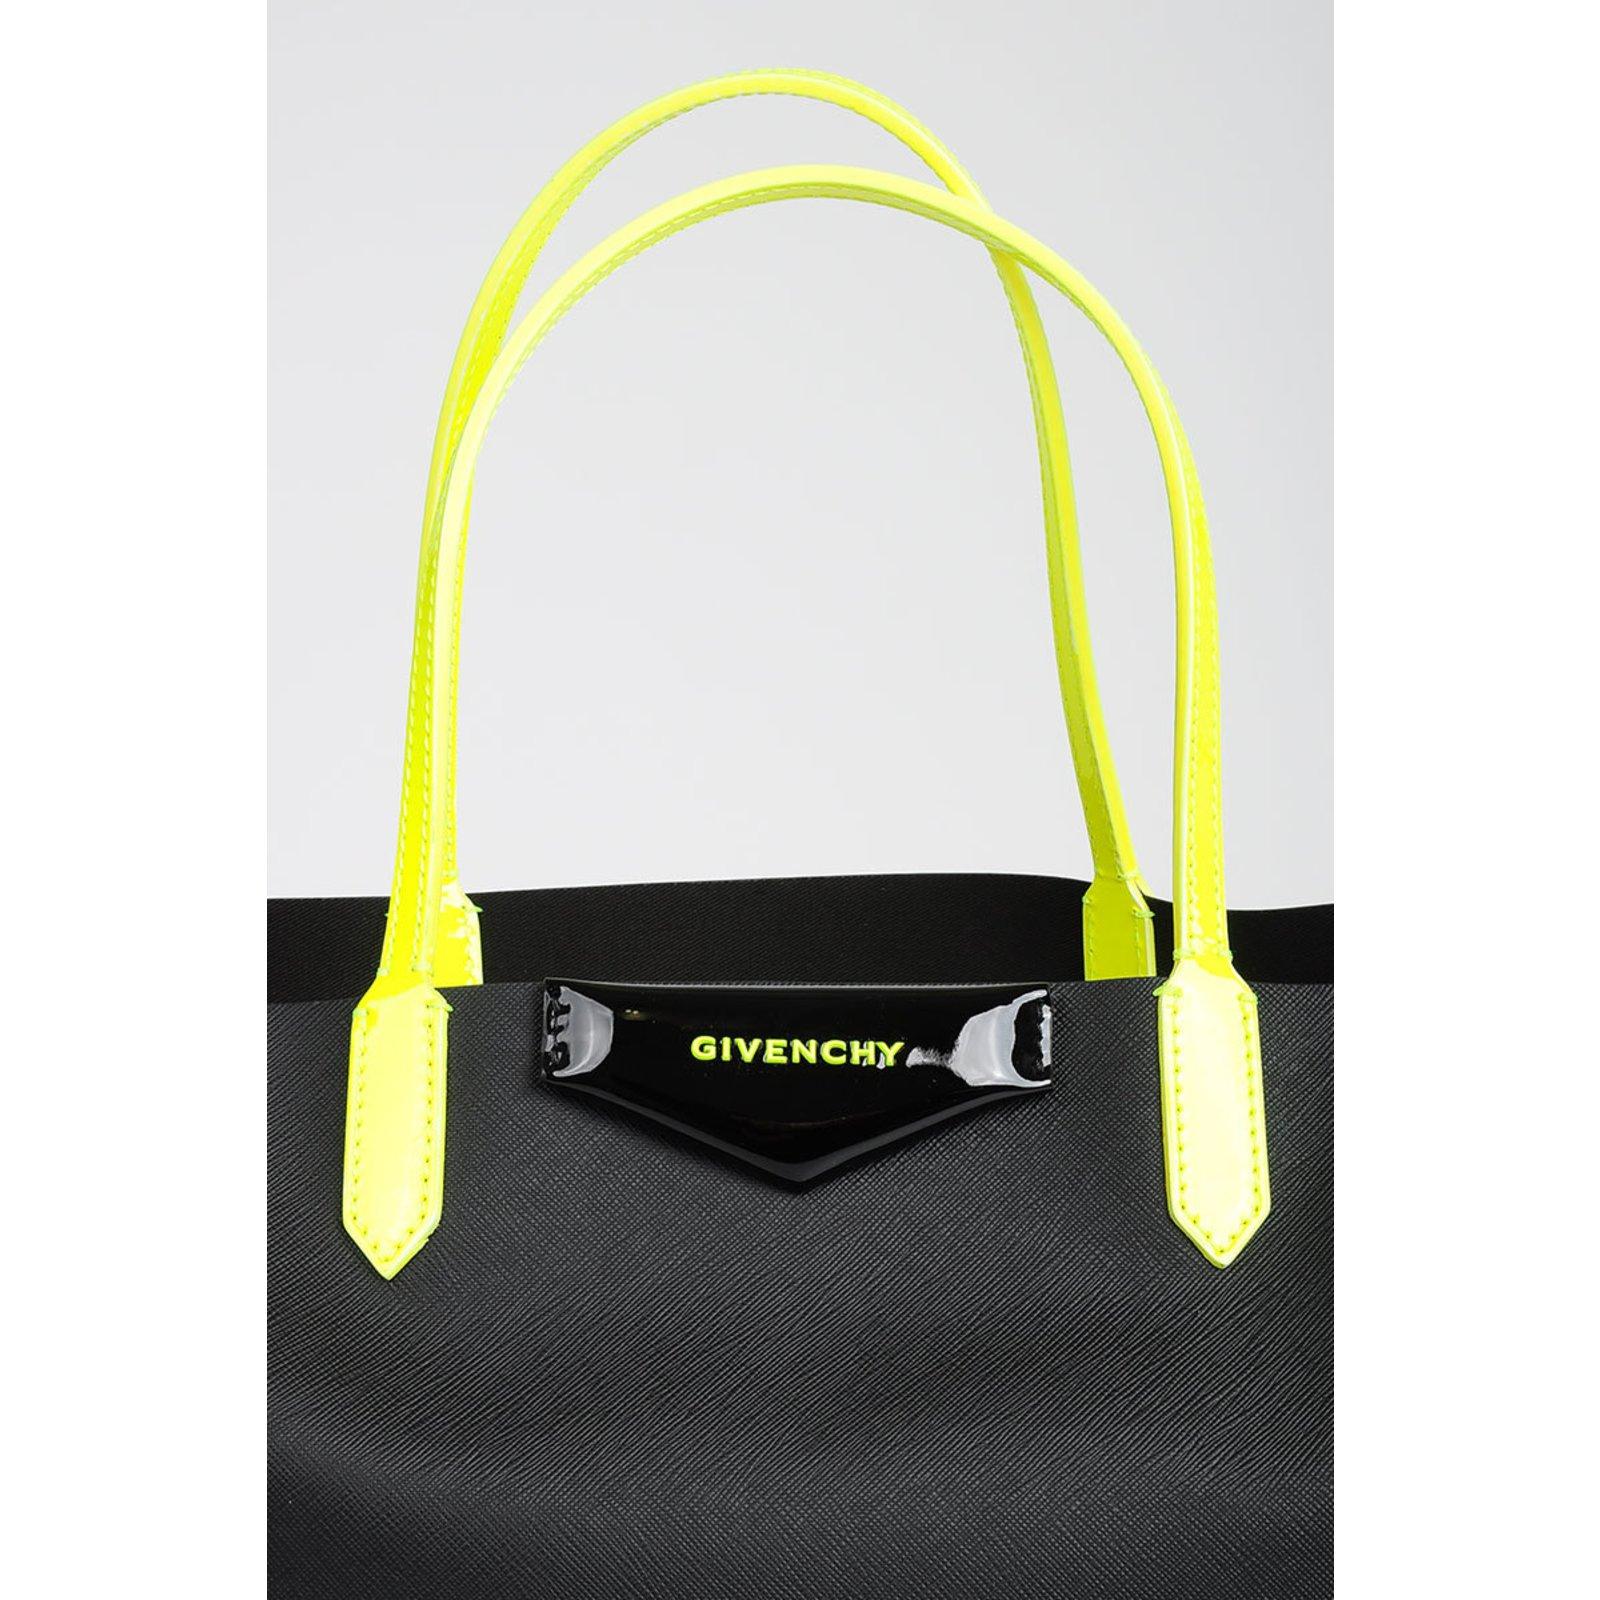 572f539ca8 Facebook · Pin This. Givenchy Handbag Handbags Other Black ref.76213